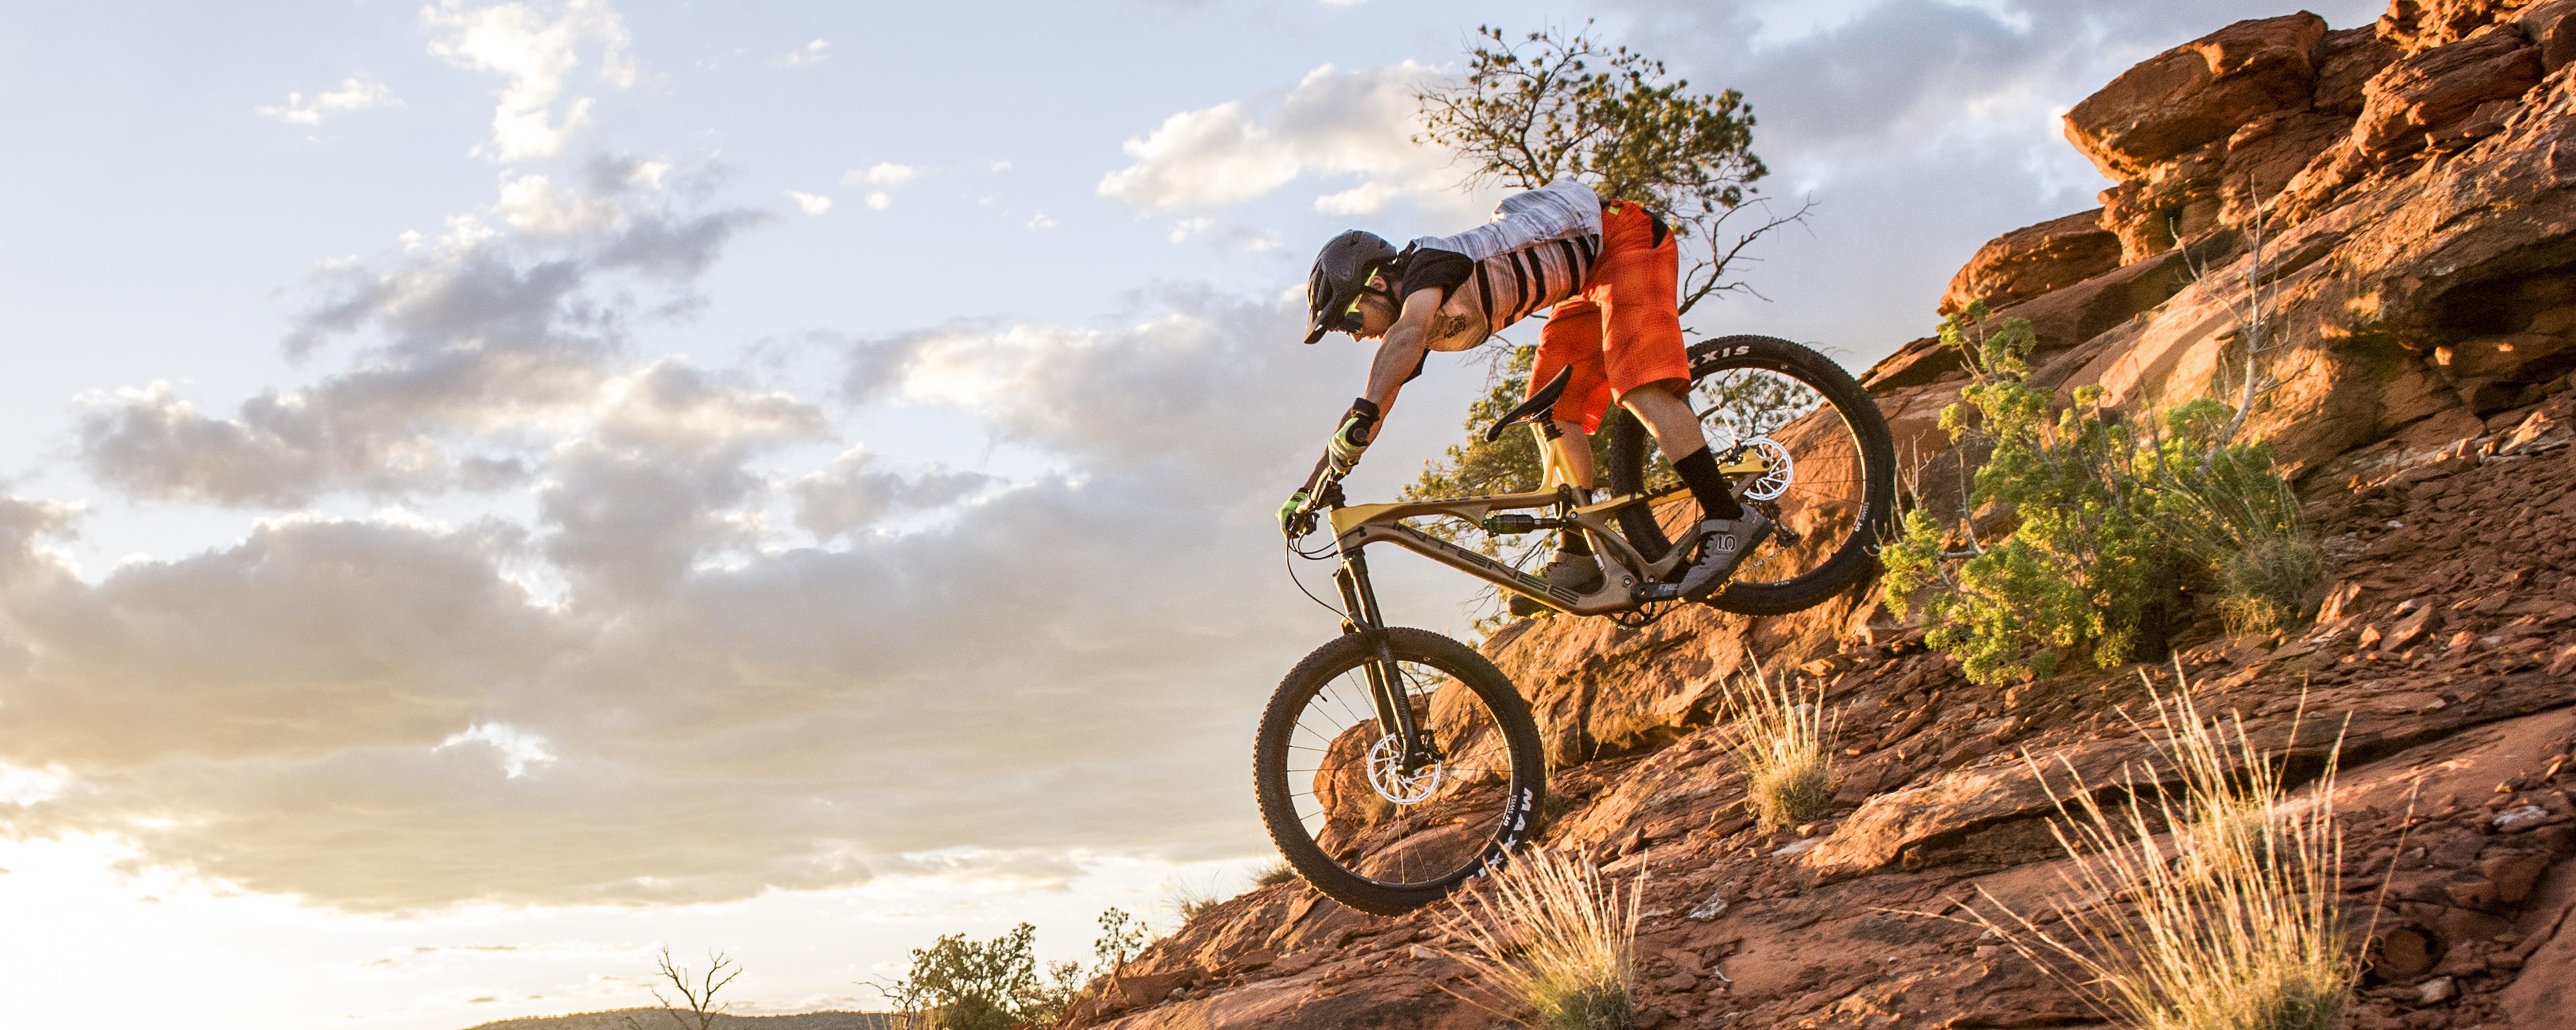 Mountain biking | MEC